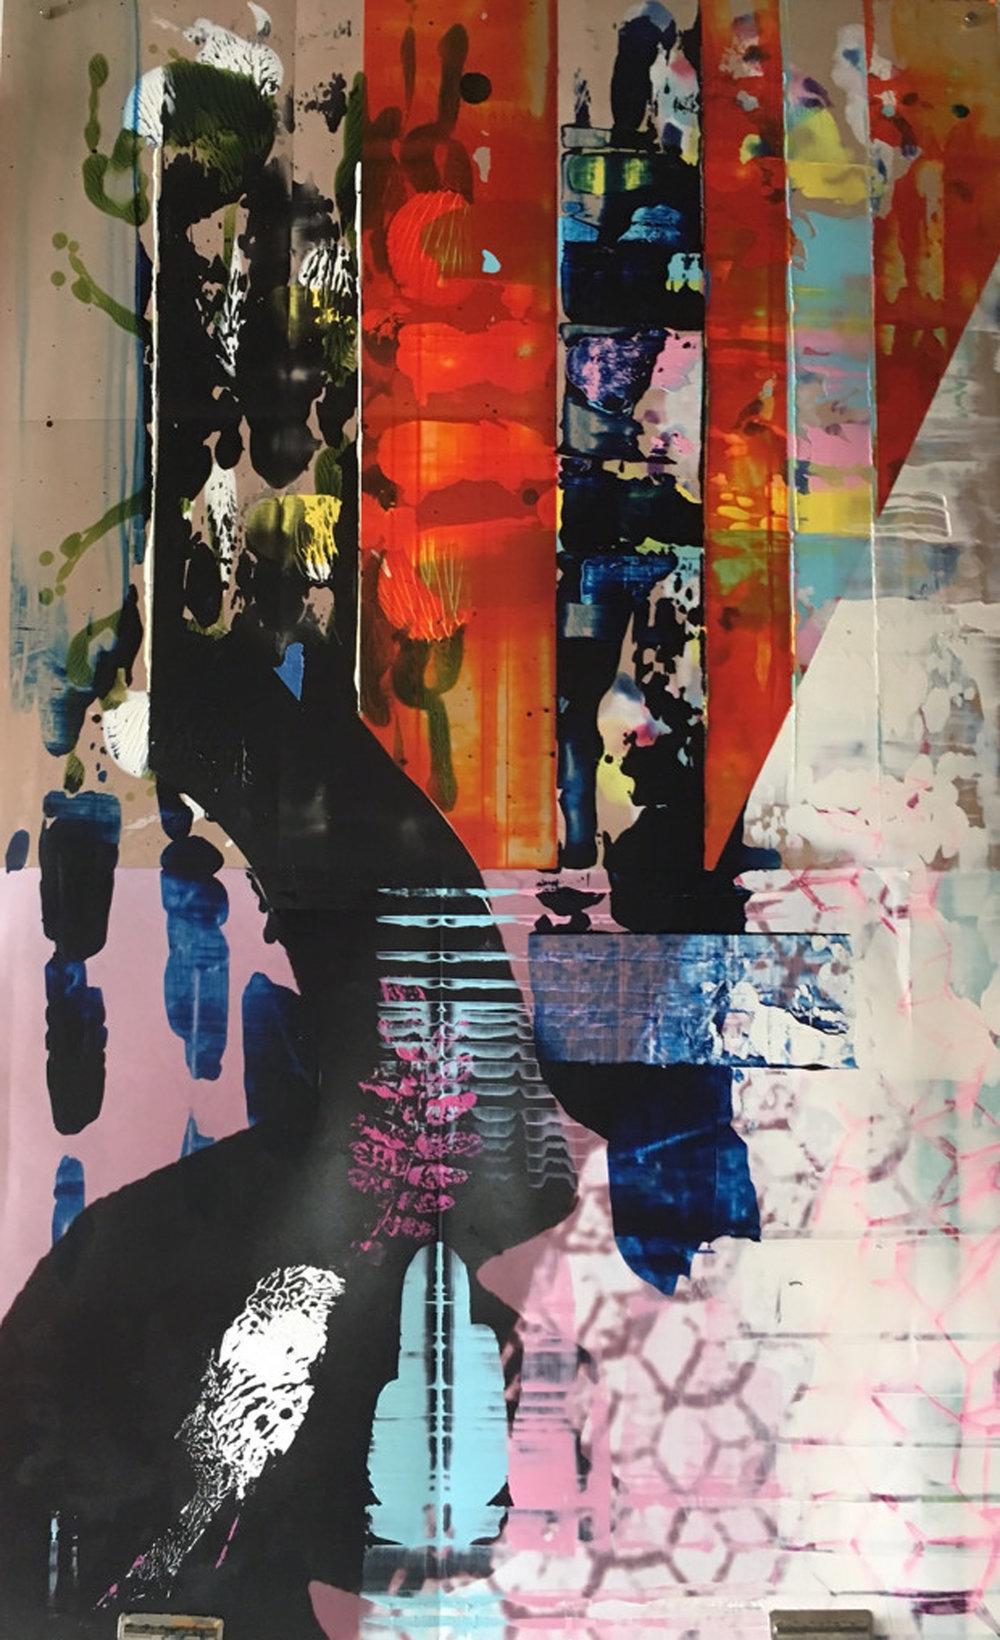 Fowl's Fodder, 22.25 x 35.5 inches / 57 x 90 cm, galkyd oil on chromogranic print, 2017